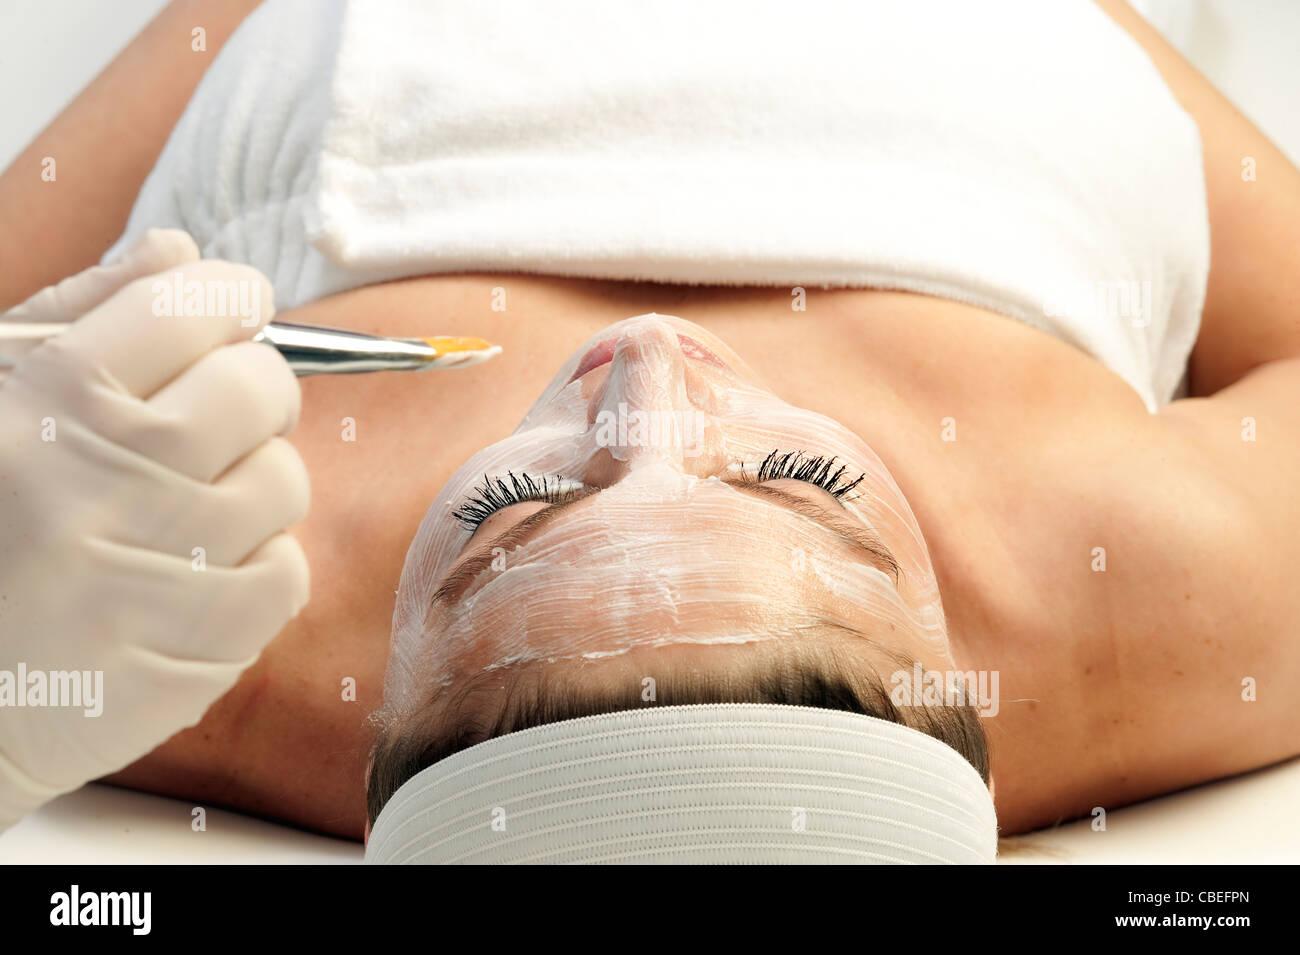 Woman getting a facial treatment dans un spa. Photo Stock